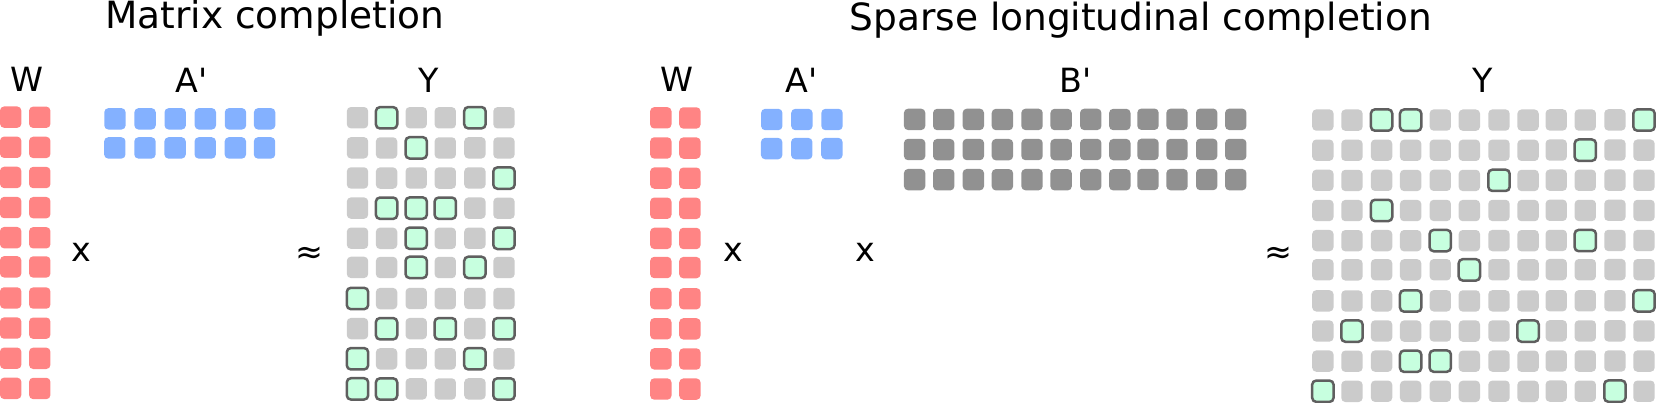 Matrix completion and sparse longitudinal completion